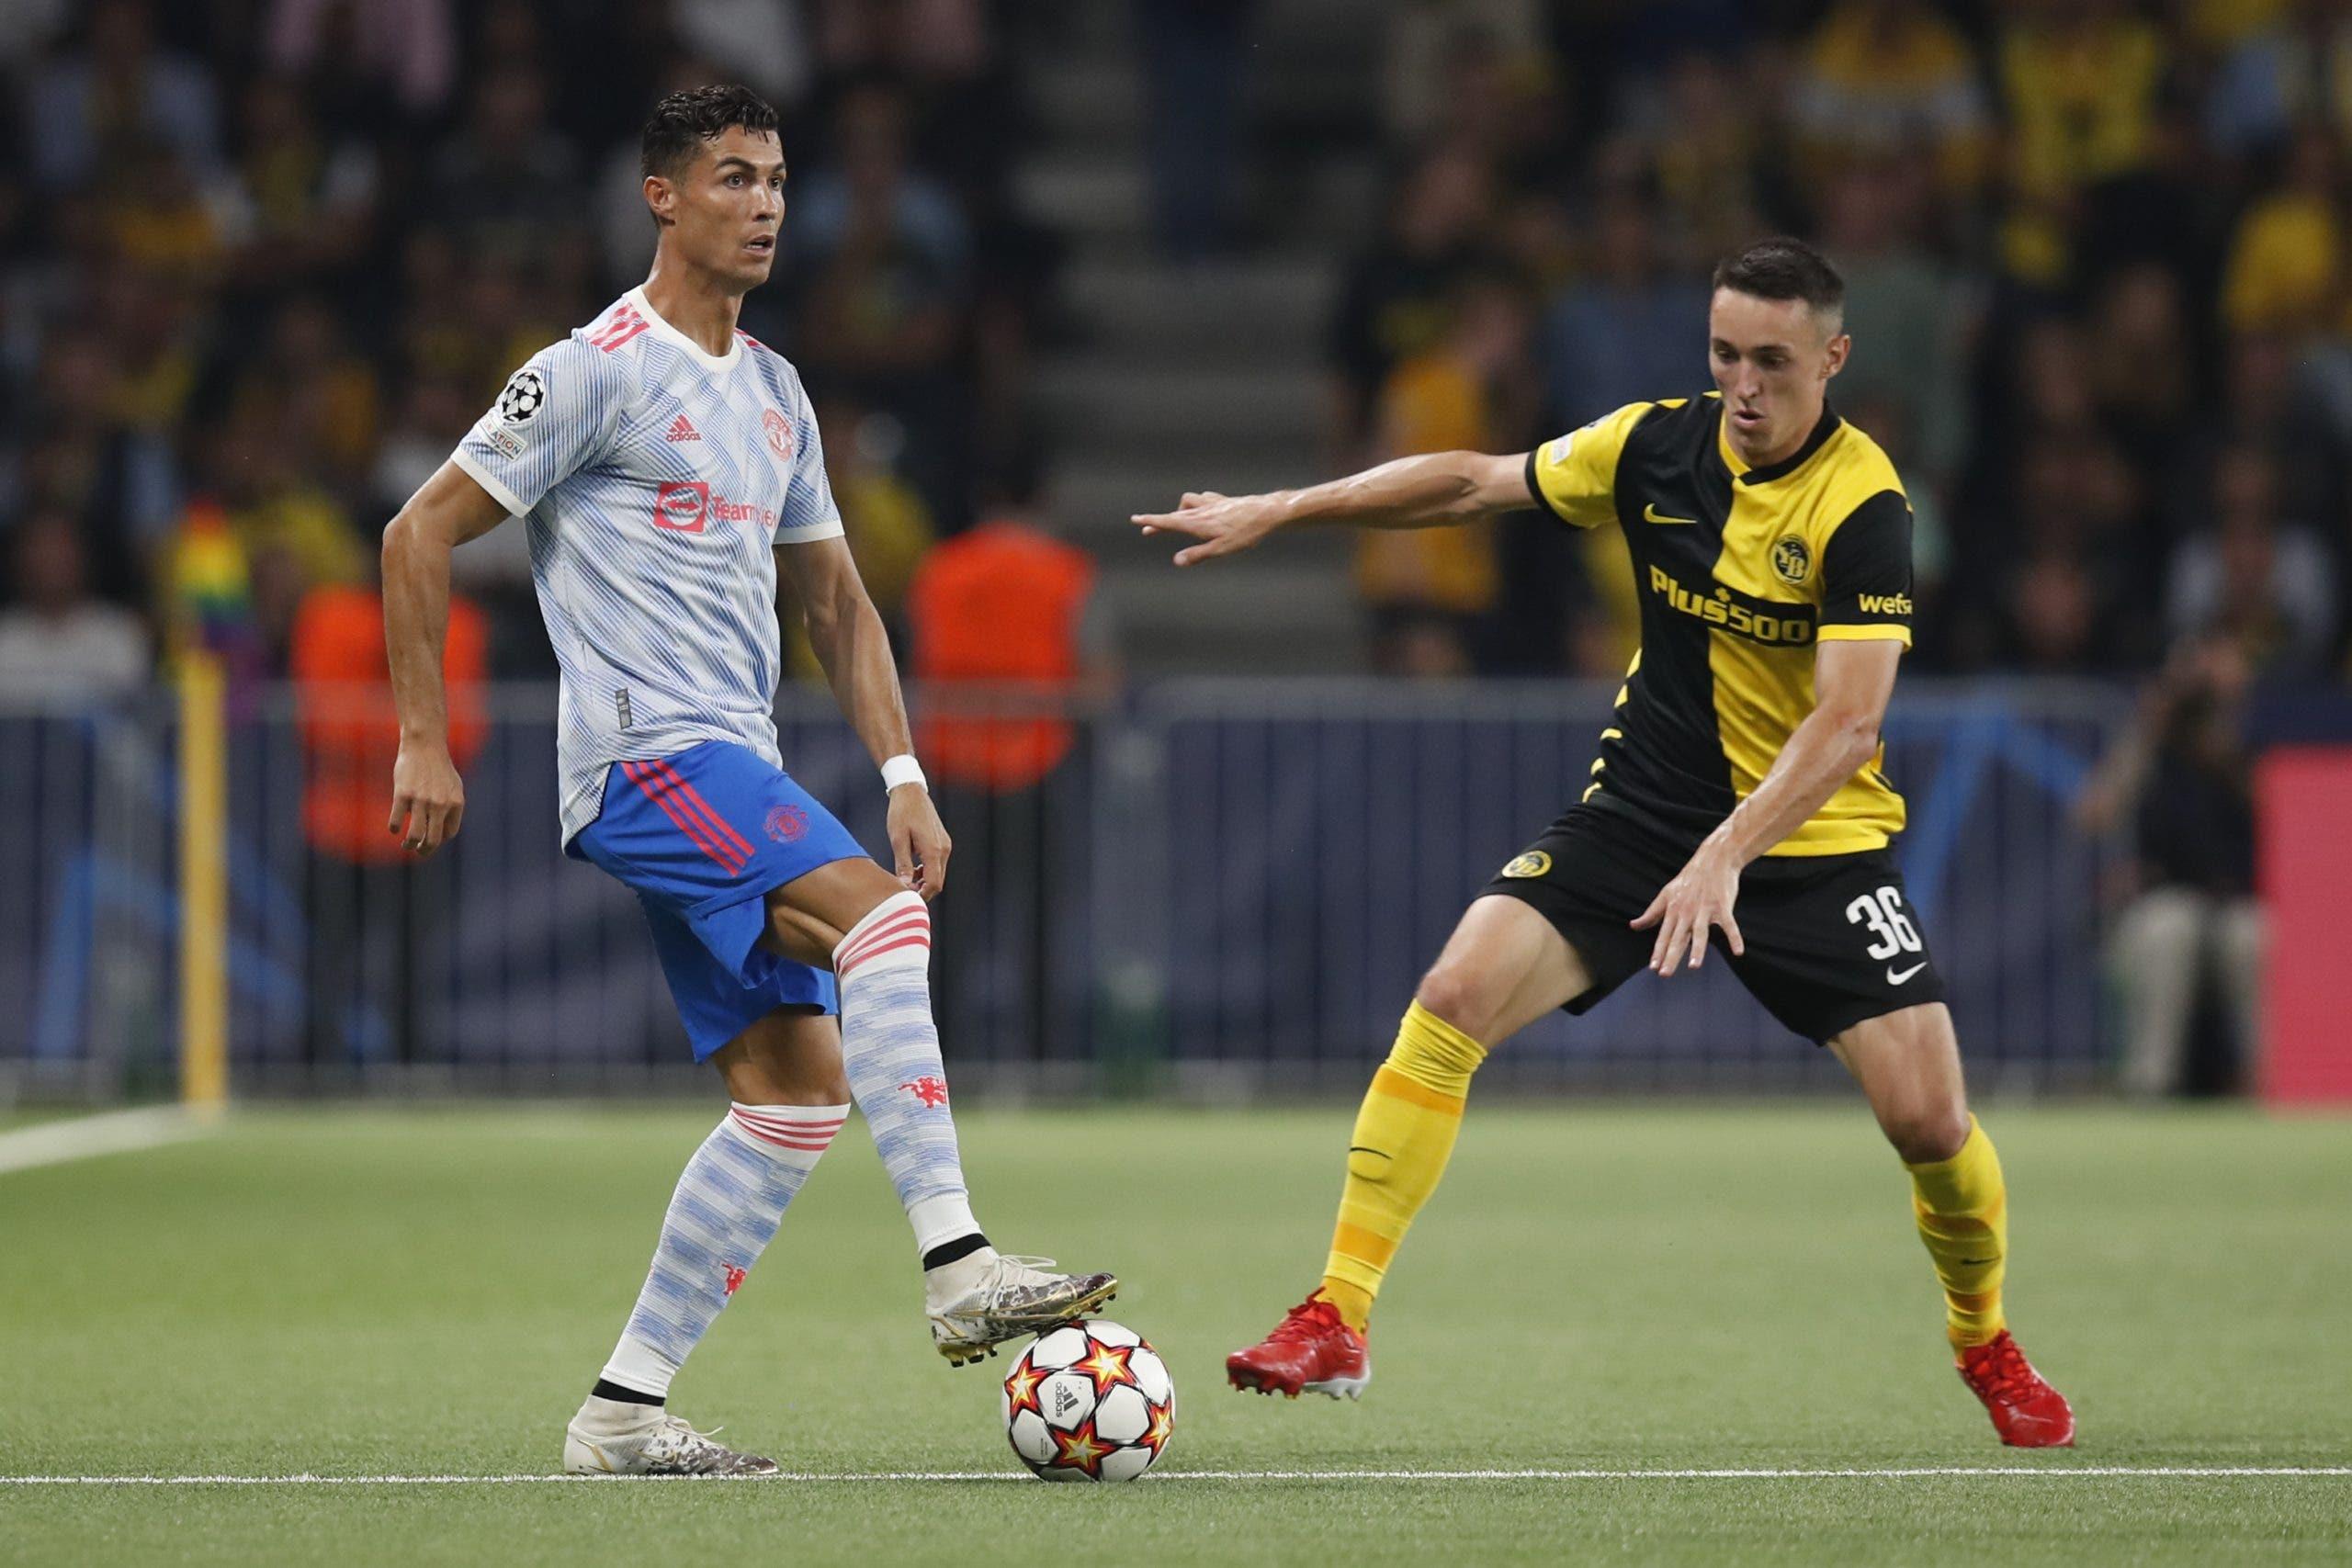 Cristiano Ronaldo anota, pero Man U cae 2-1 ante Young Boys